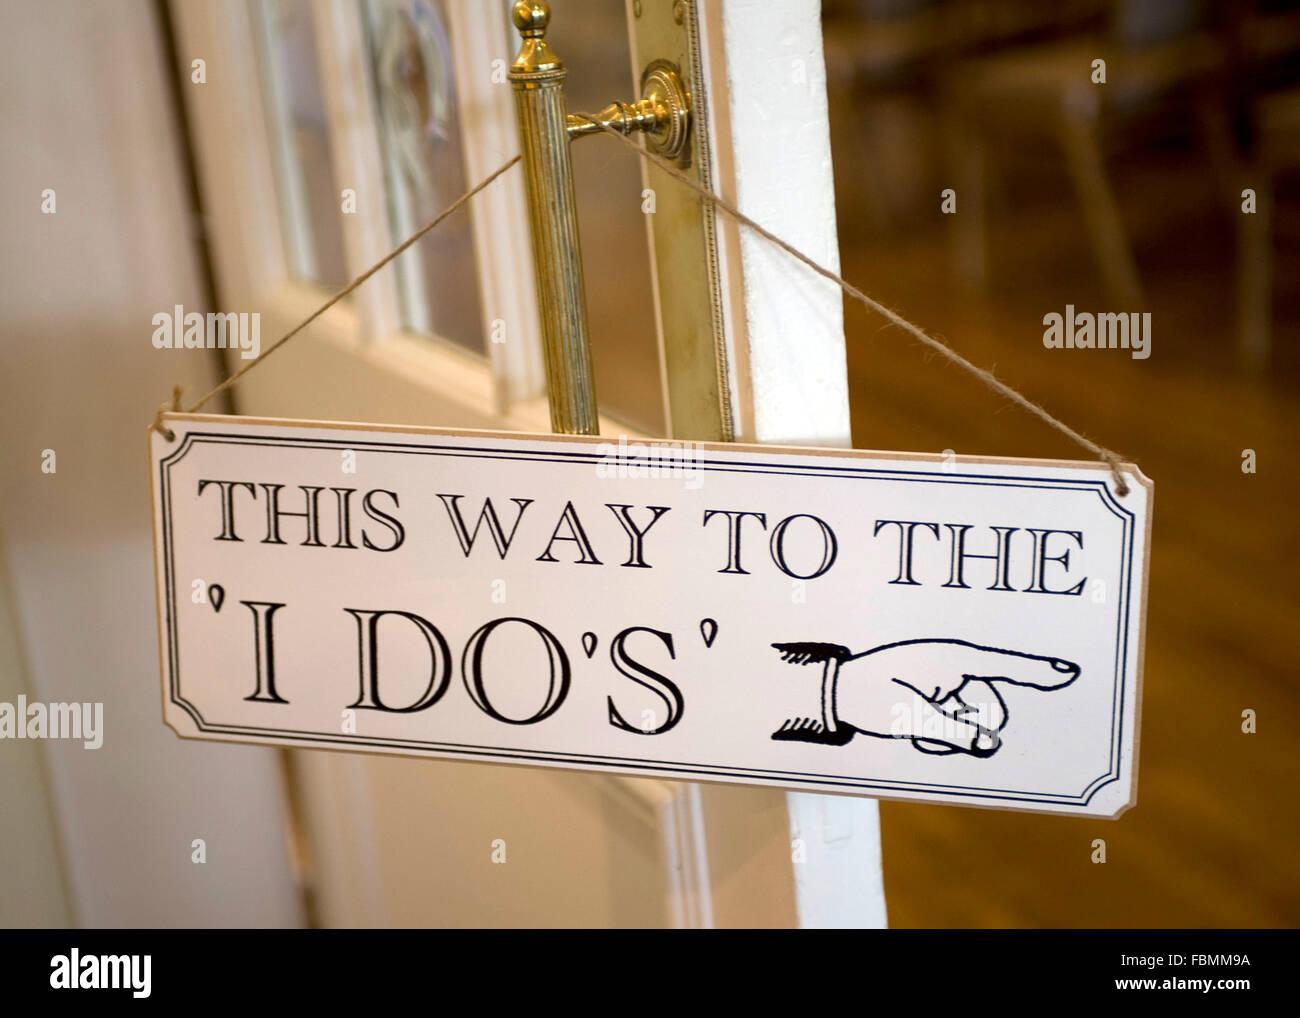 Sign for weddings saying 'I do' - Stock Image